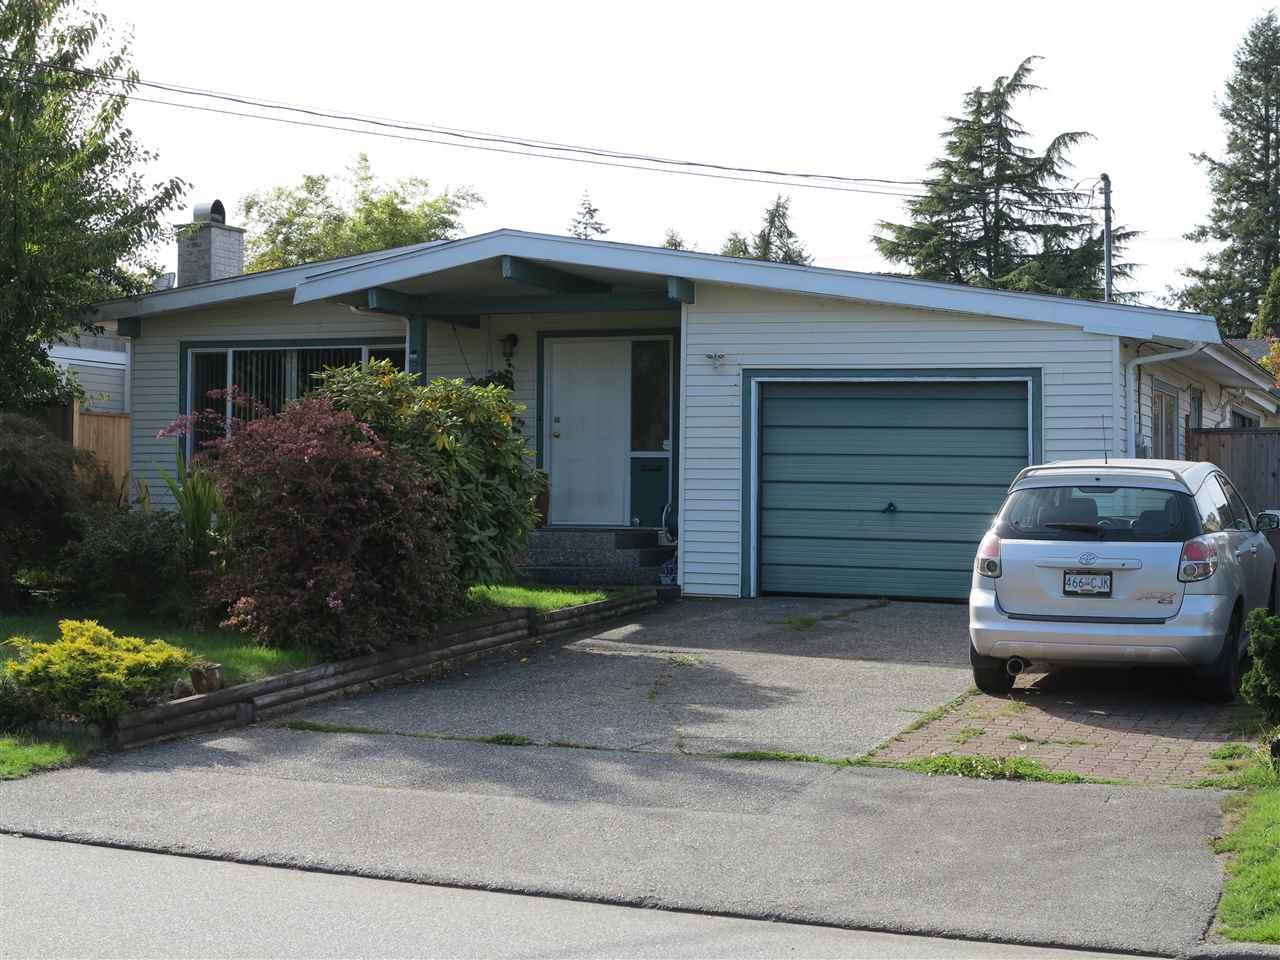 Pleasant 1341 Maple Street White Rock Zolo Ca Complete Home Design Collection Barbaintelli Responsecom